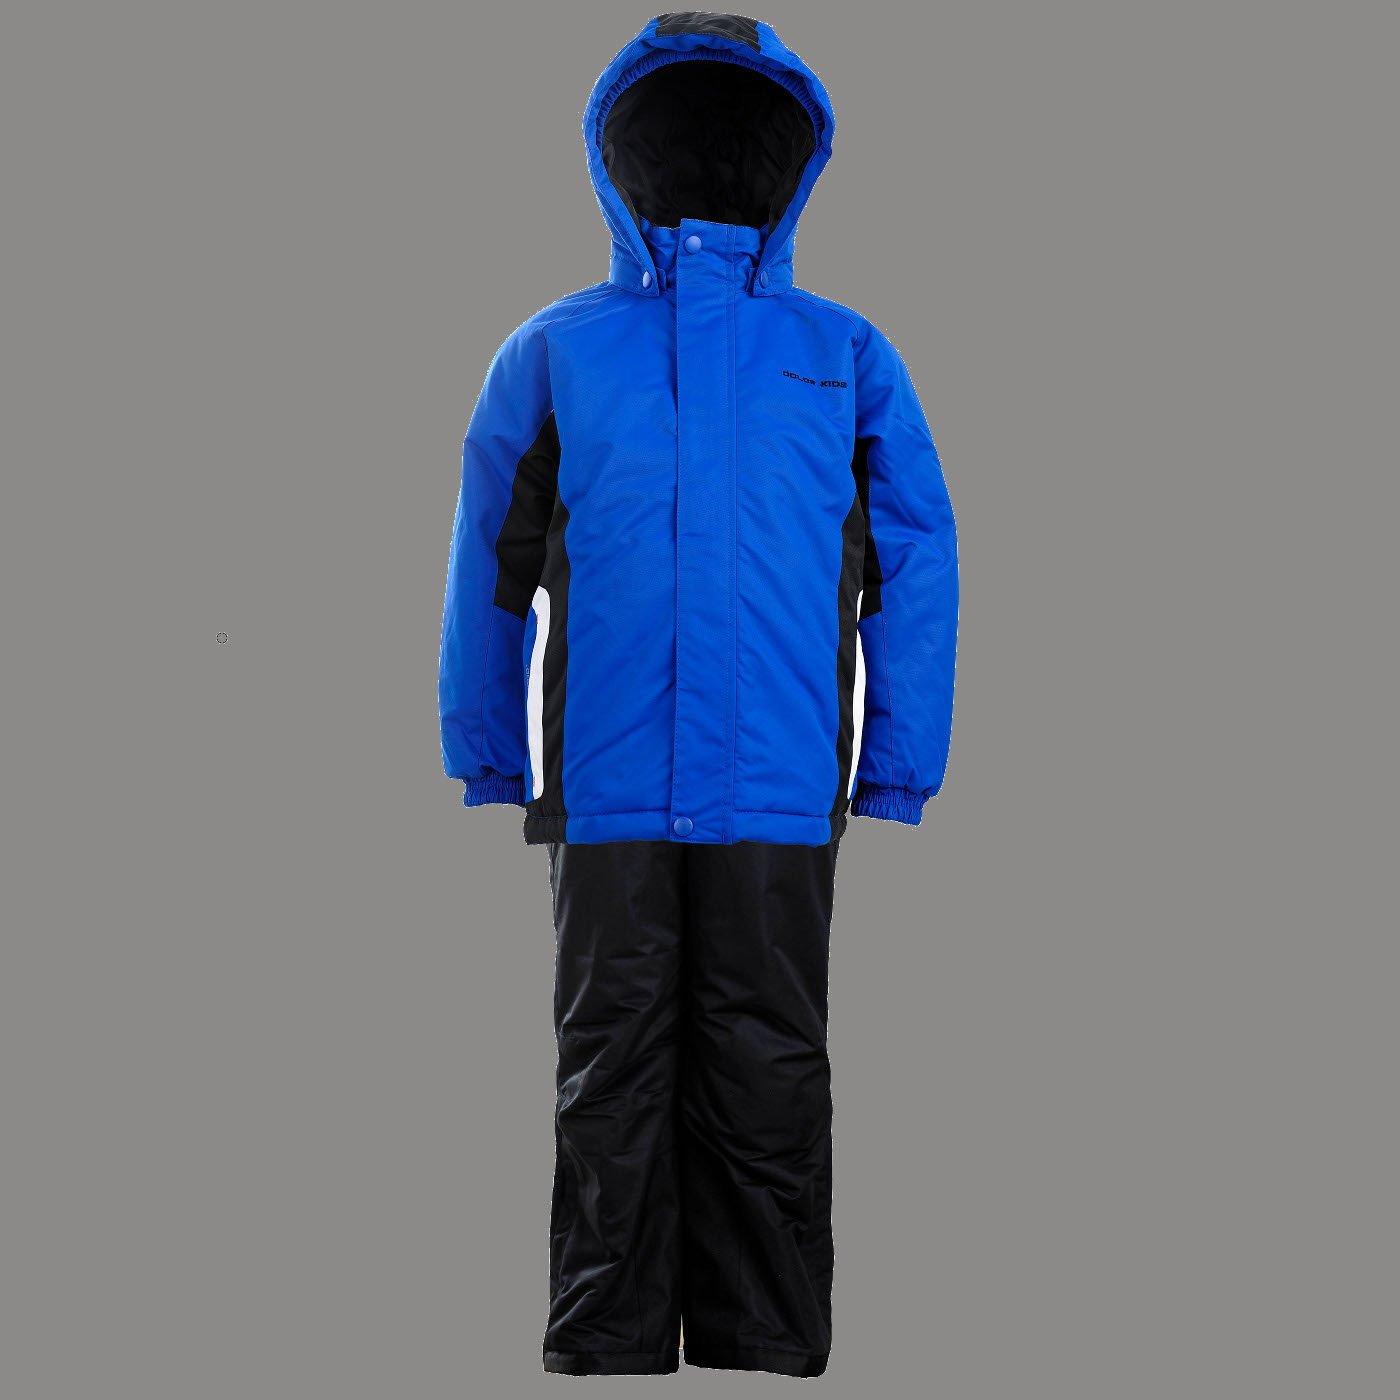 Color Kids.Ski-Anzug, Jenin Ski Set Air-flo 2000, blue danube. 101289-0197